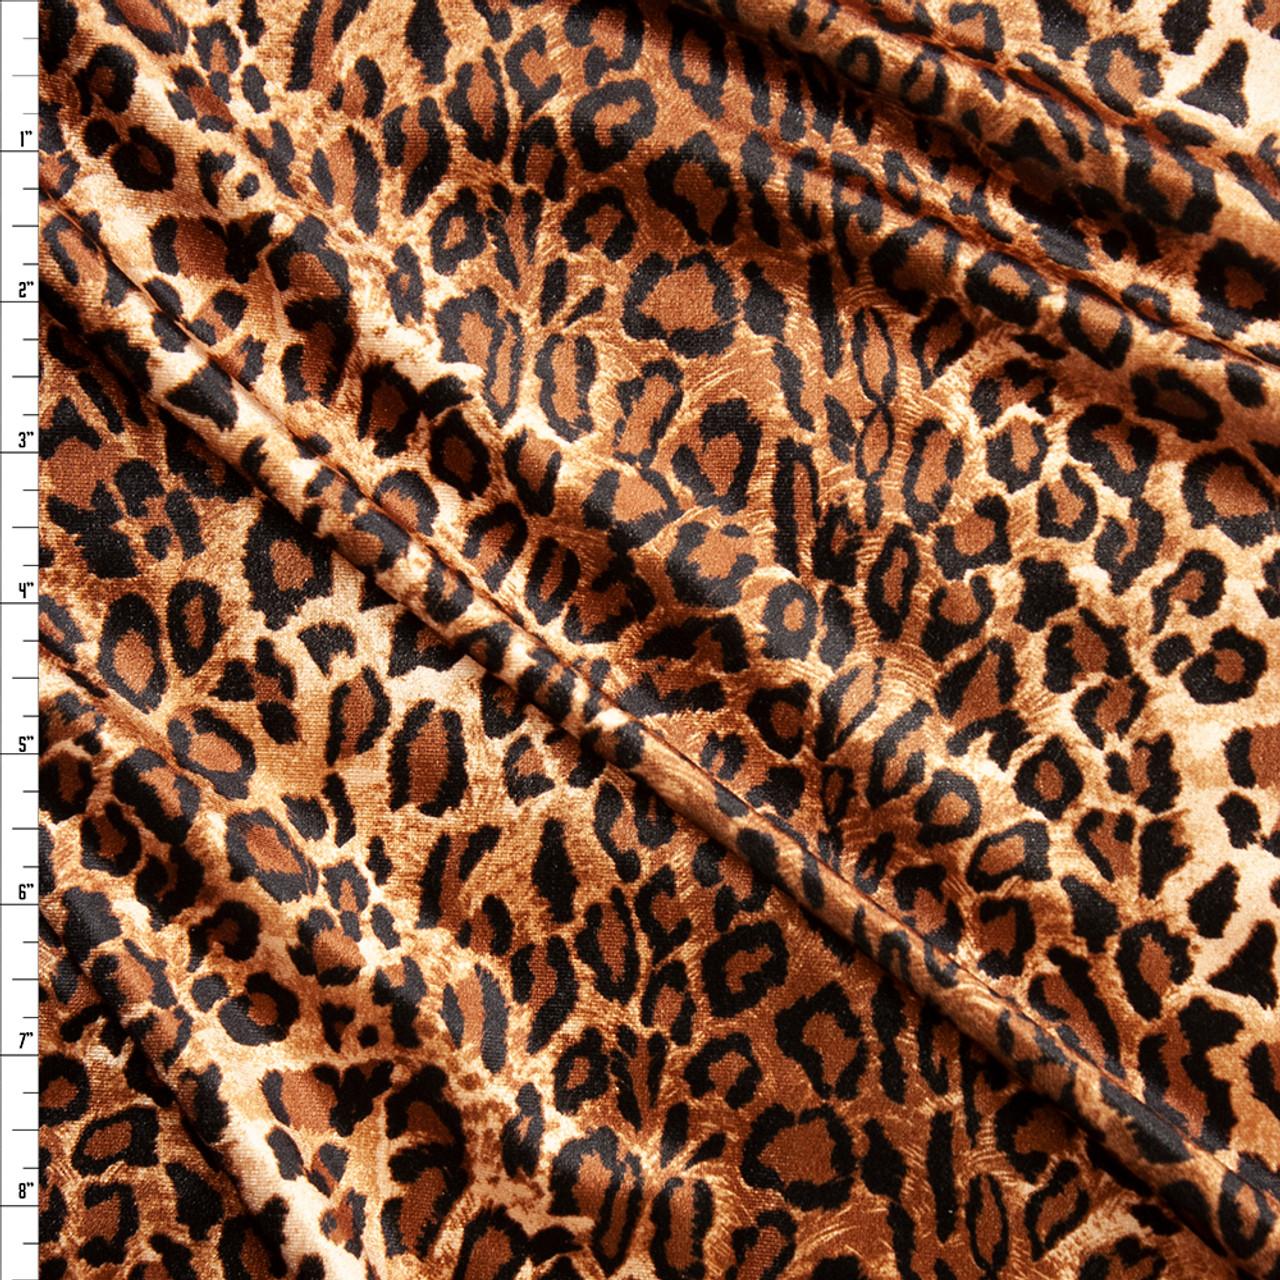 e039732eac Cali Fabrics Brown and Tan Cheetah Print 4-way Stretch Velvet Fabric ...